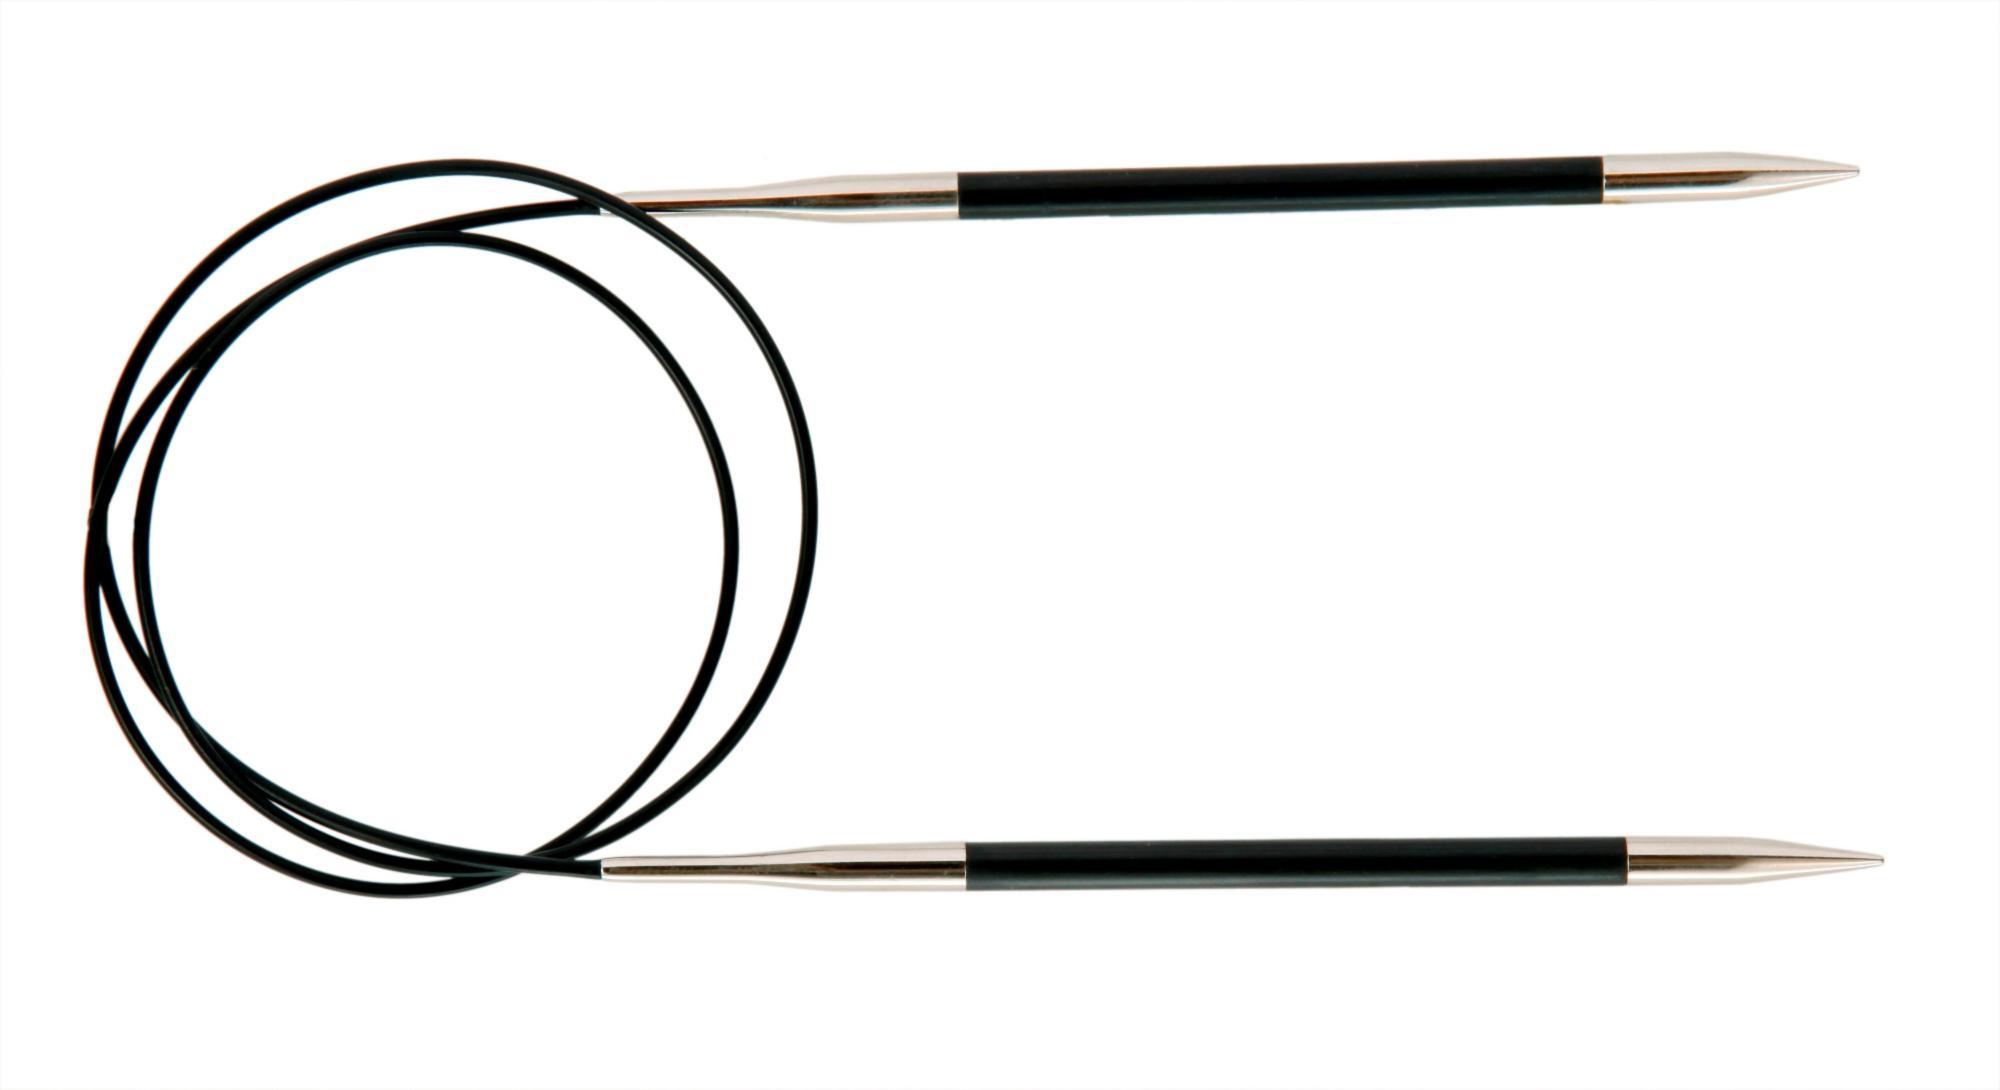 Спицы круговые 40 см Karbonz KnitPro, 41141, 2.25 мм